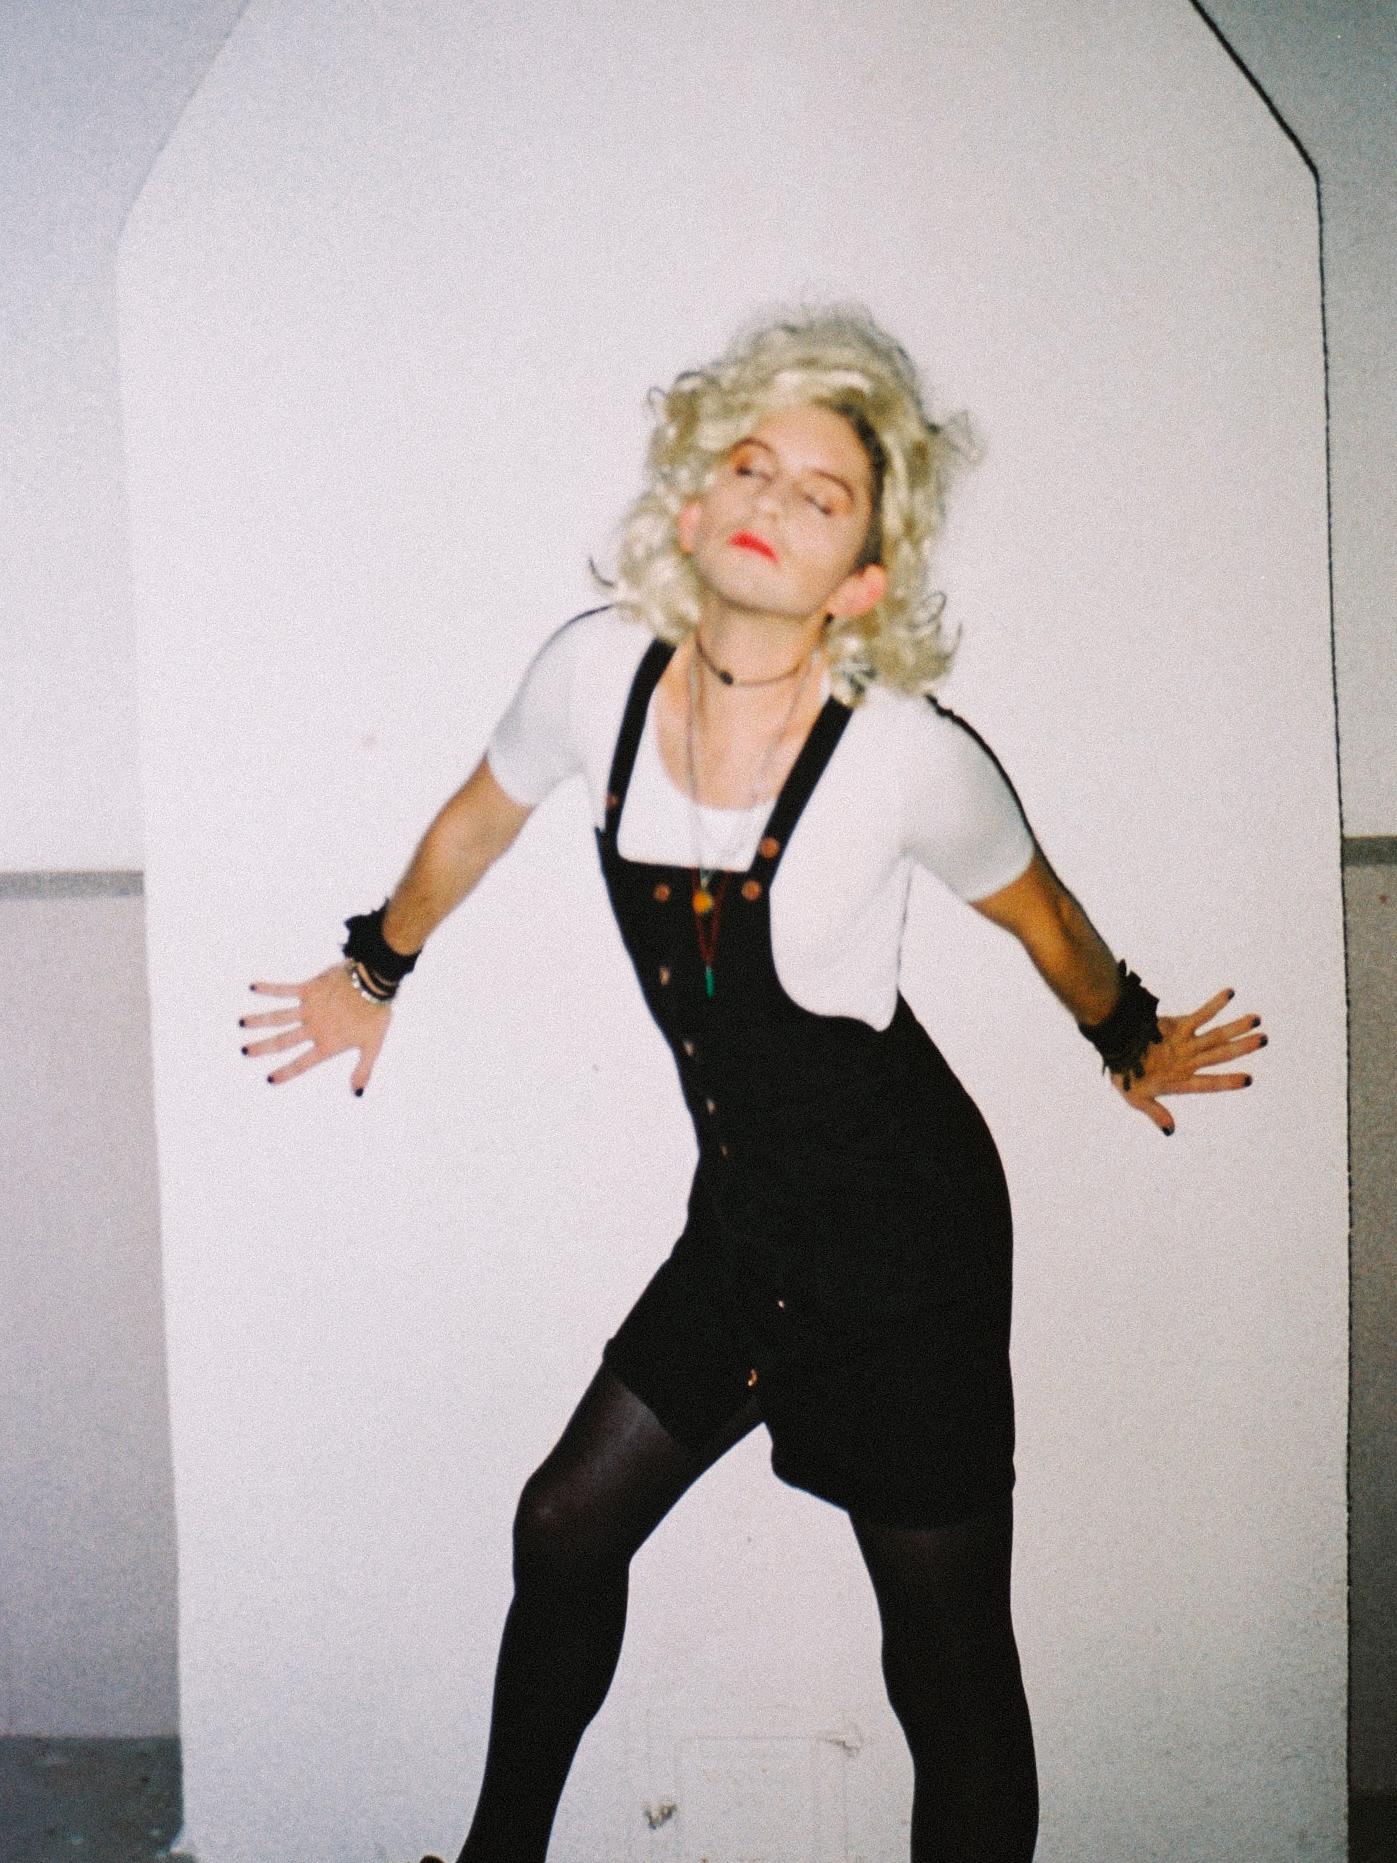 new york fashion photographer-9.jpg